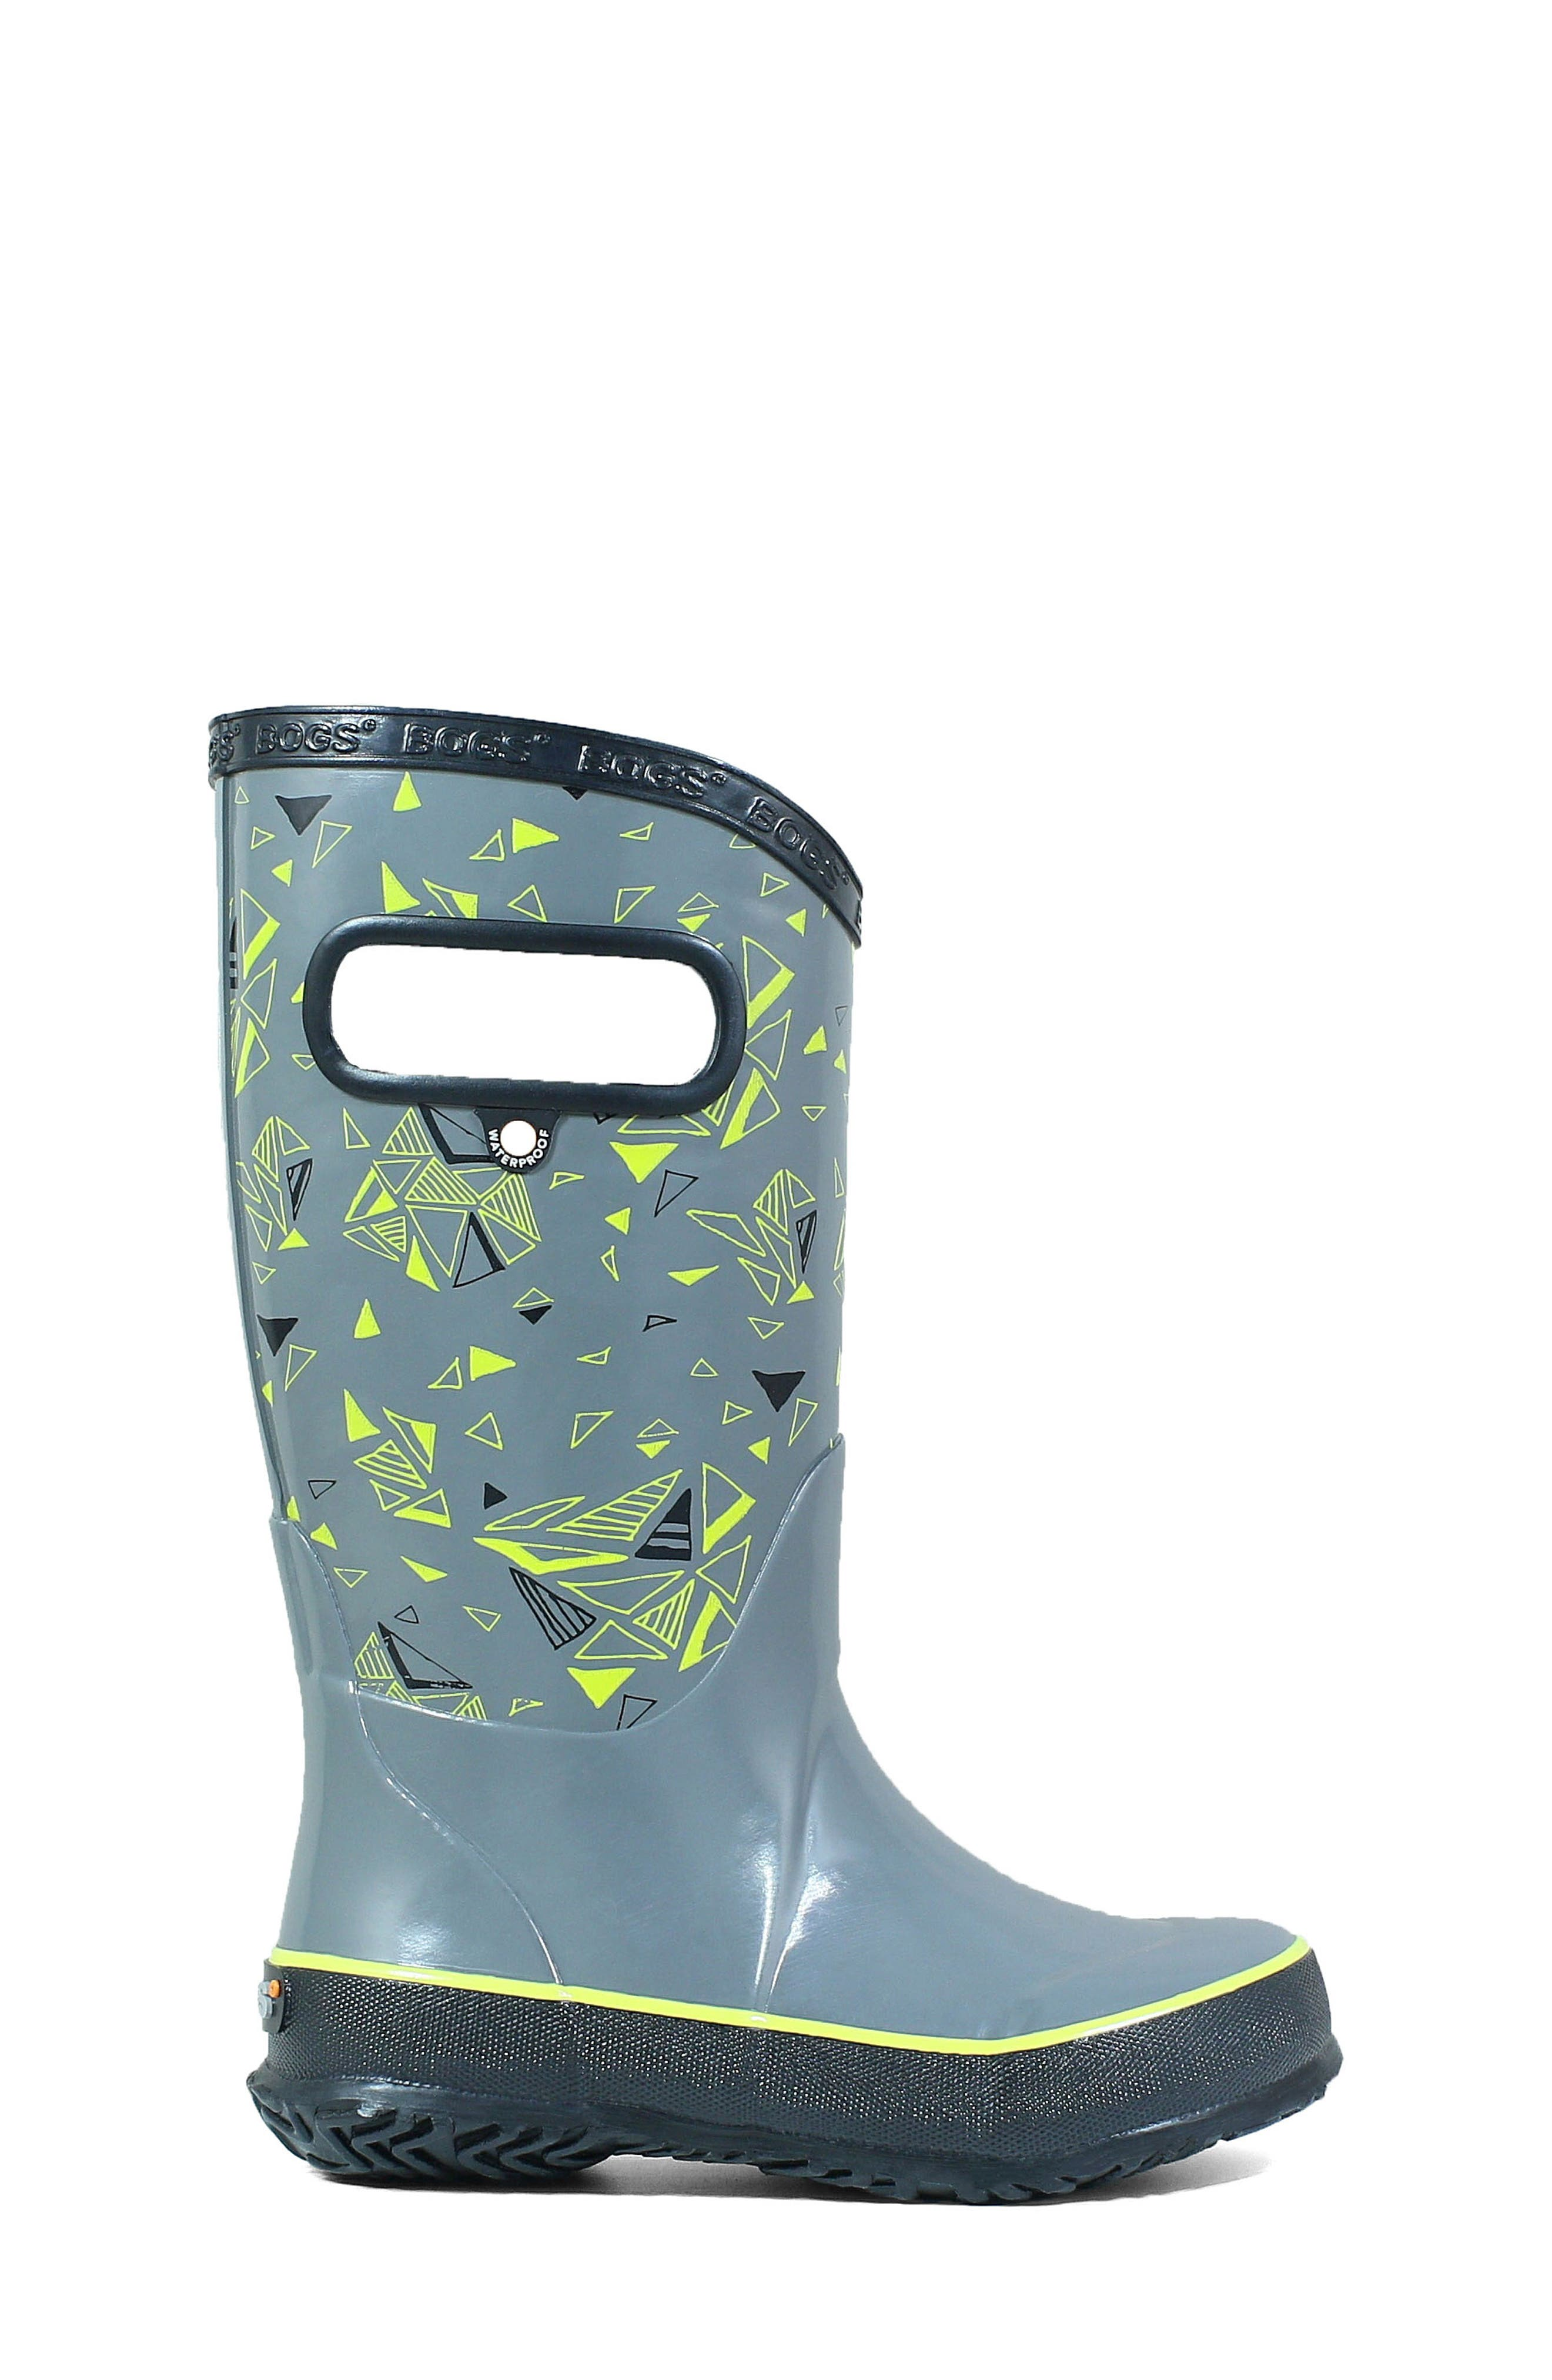 BOGS, Triego Waterproof Rain Boot, Alternate thumbnail 3, color, GRAY MULTI